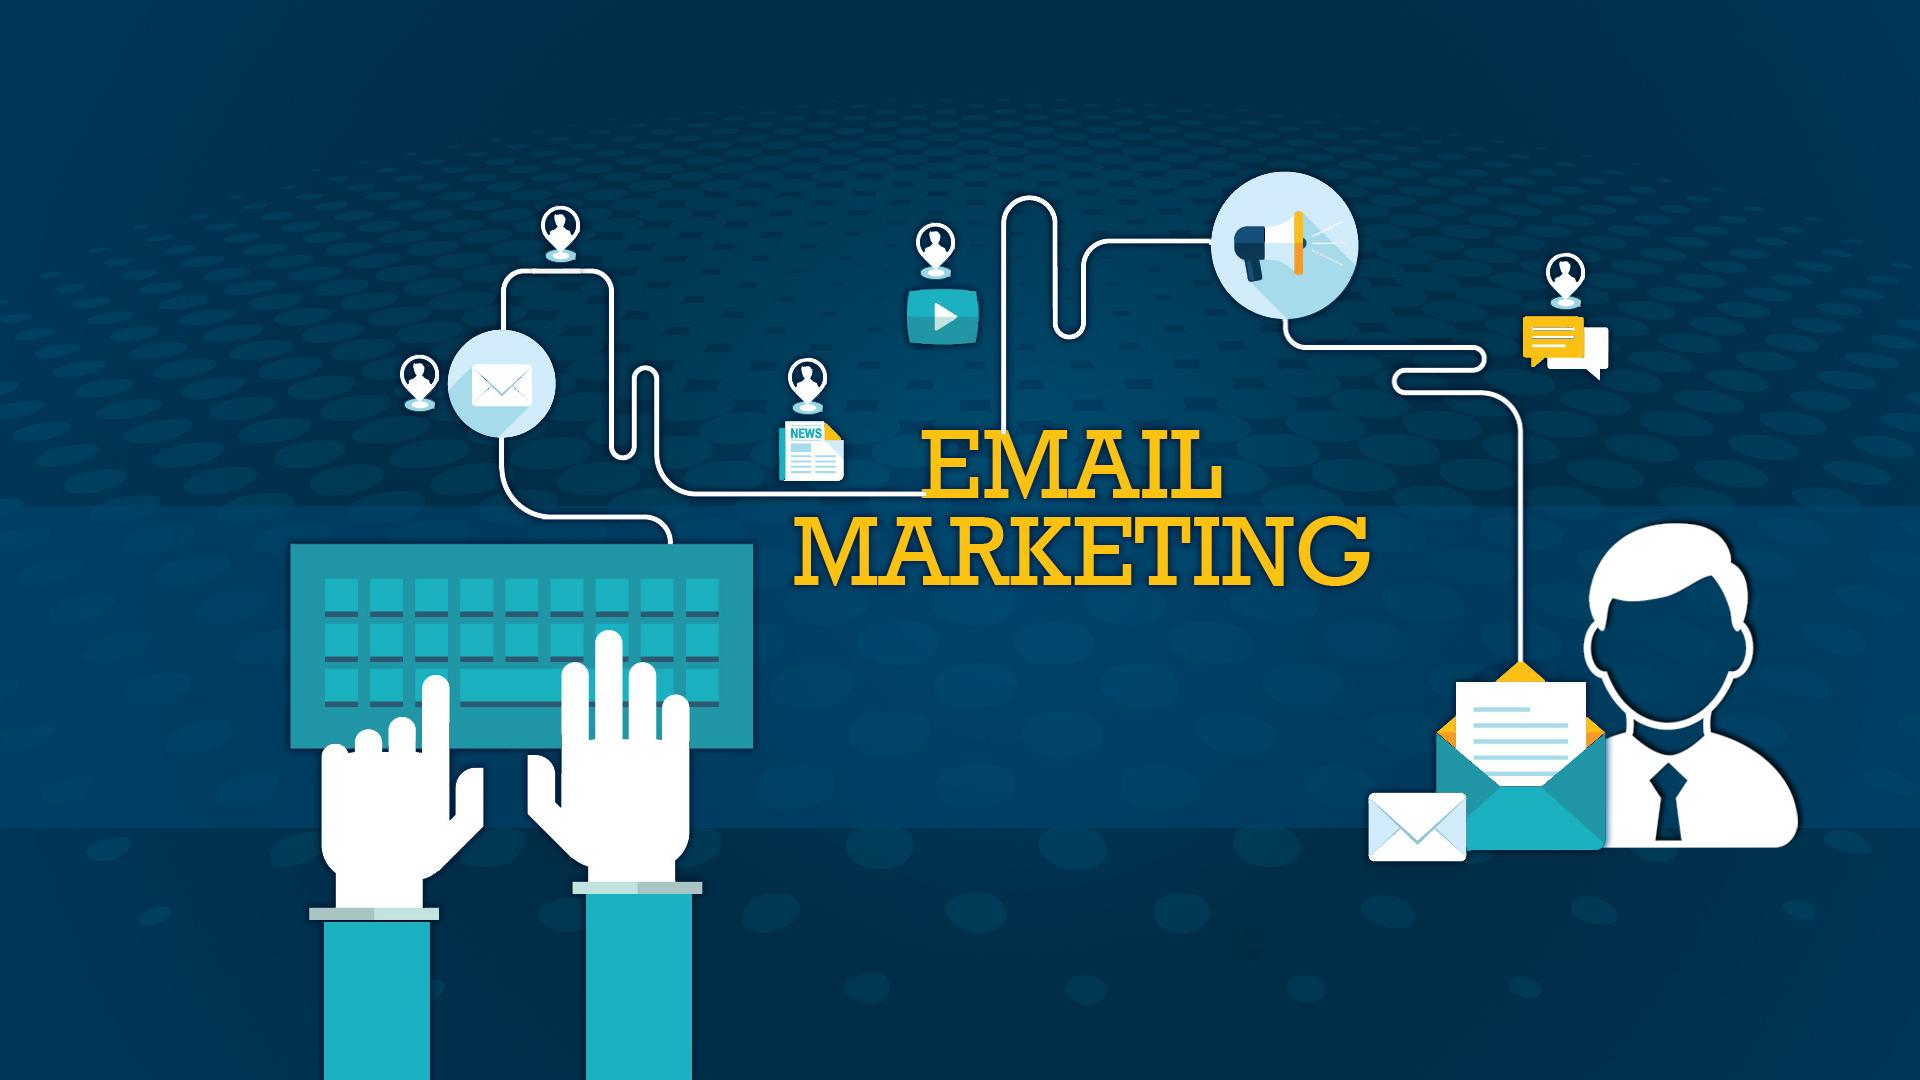 Photo of فروش بیشتر با ایمیل مارکتینگ جلسه پنجم : فرکانس ها در ایمیل و اهمیت بررسی آمار